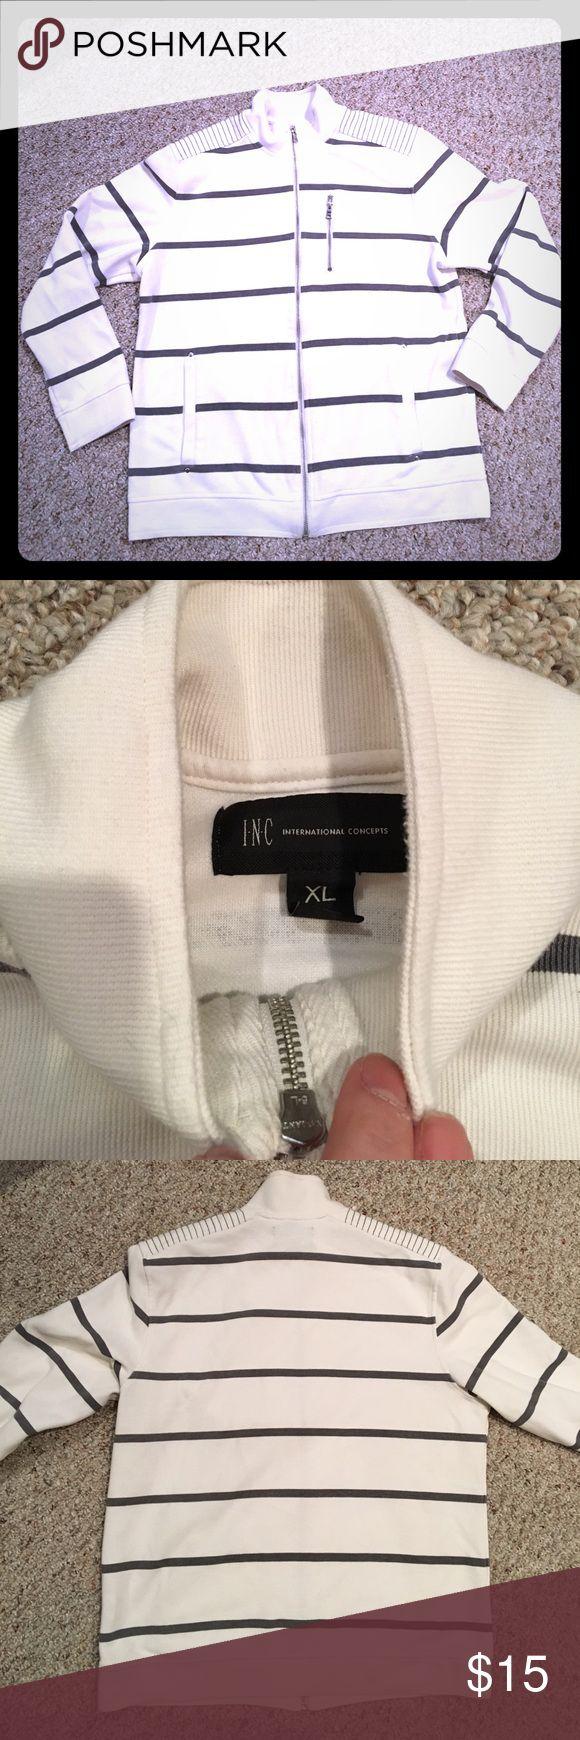 Men's striped zip up EUC INC zip up. INC International Concepts Shirts Sweatshirts & Hoodies